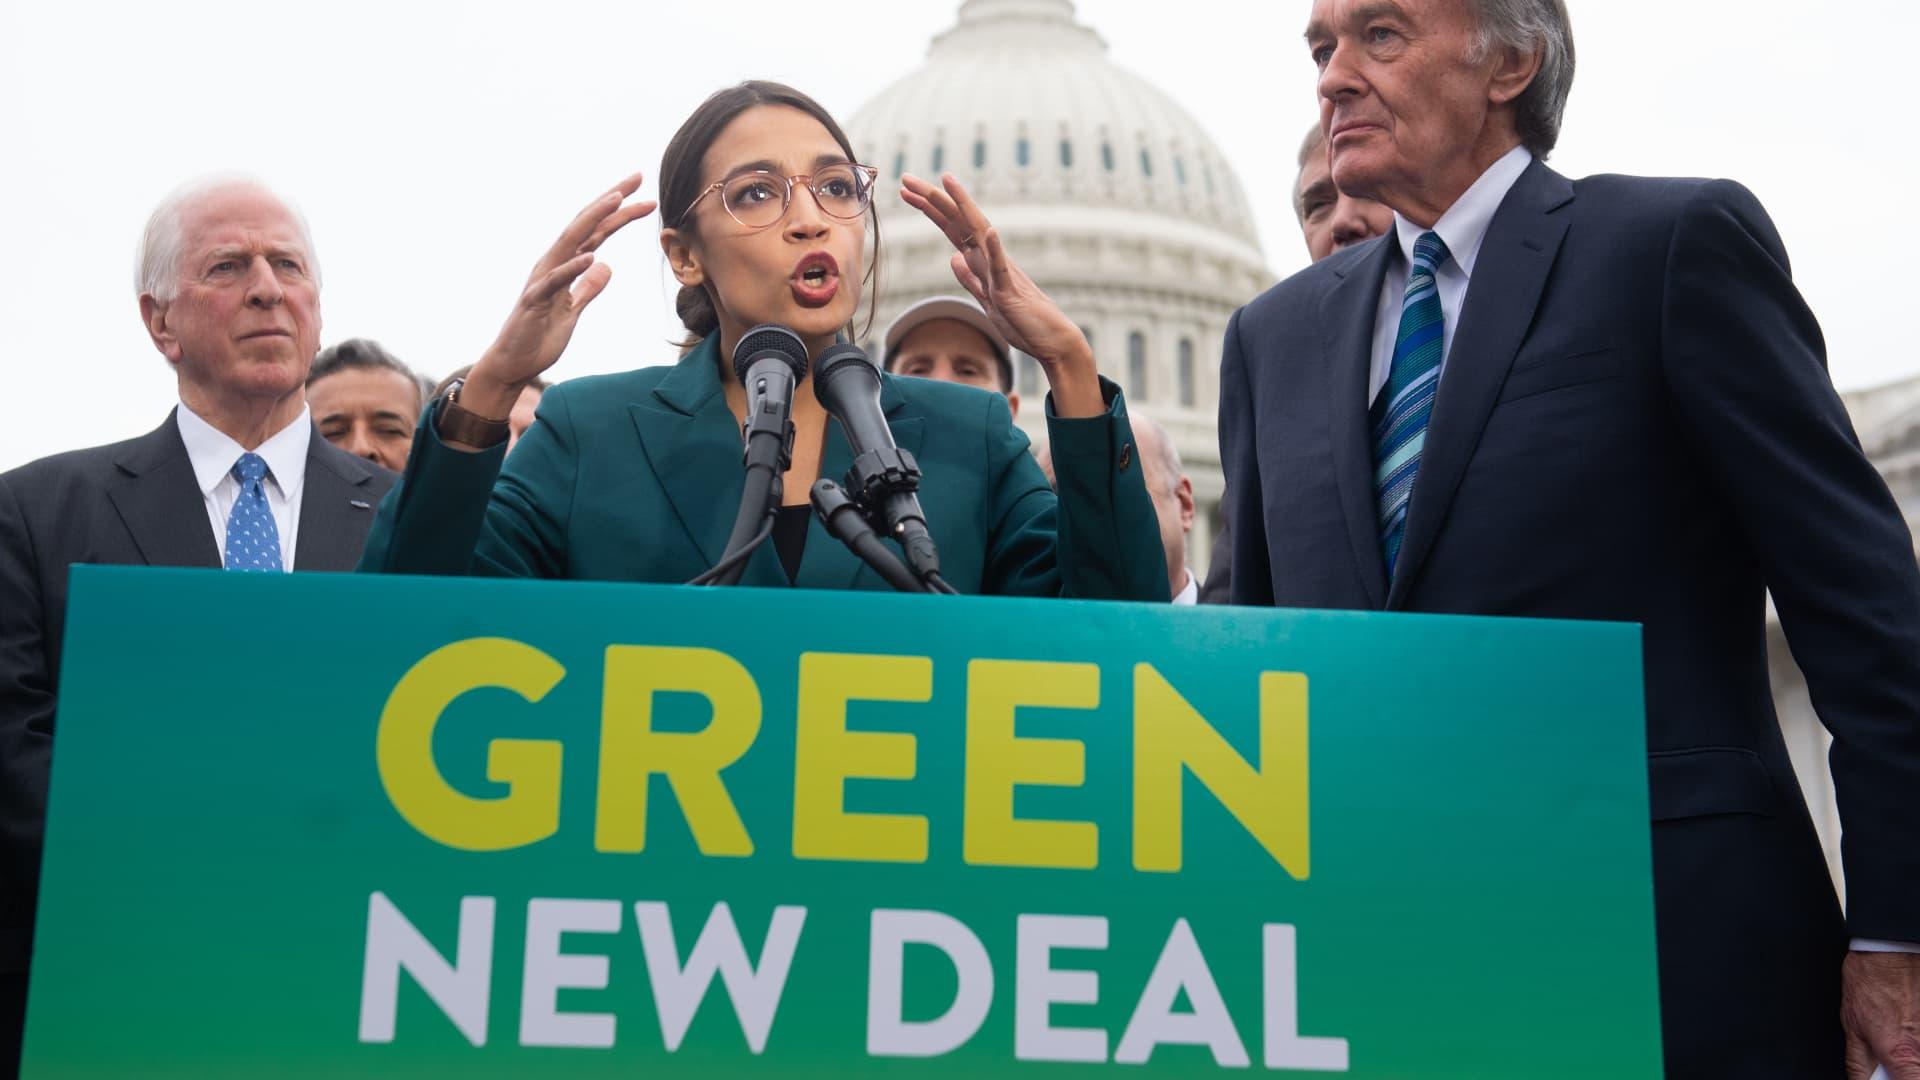 Representative Alexandria Ocasio-Cortez, Democrat of New York, and US Senator Ed Markey (R), Democrat of Massachusetts, speak during a press conference to announce Green New Deal legislation to promote clean energy programs outside the US Capitol in Washington, DC, February 7, 2019.